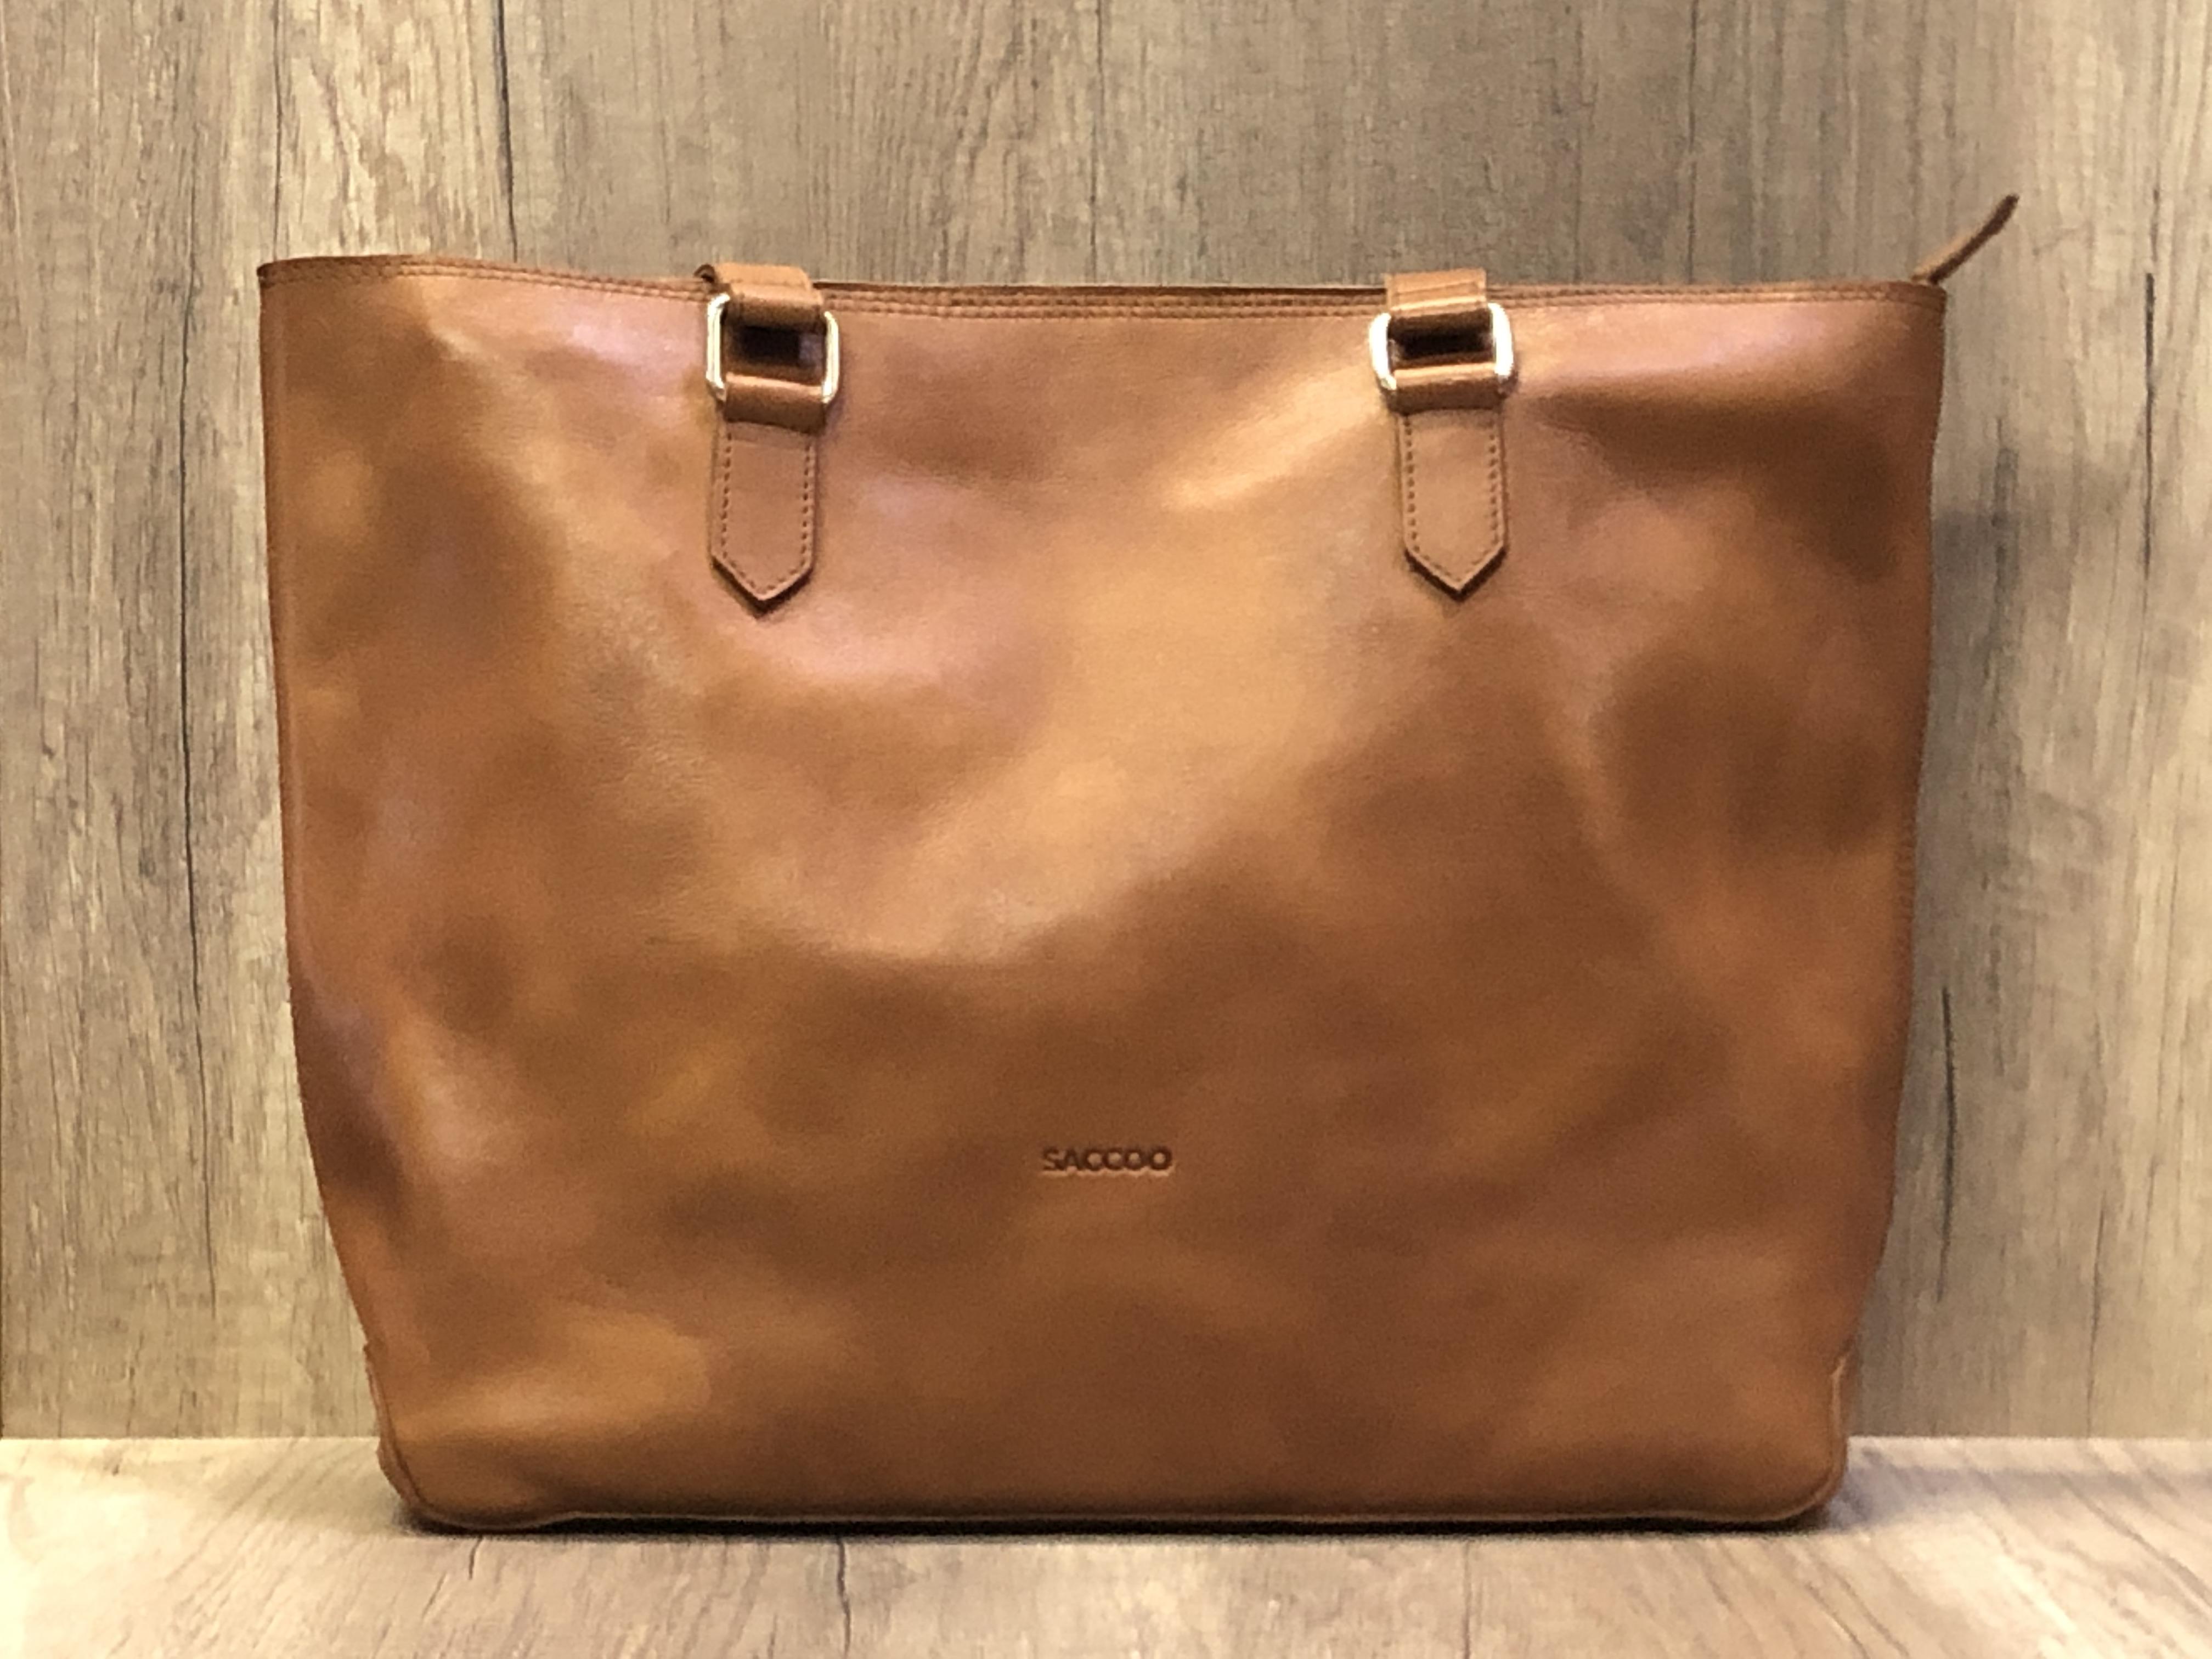 Saccoo-handtassen 18